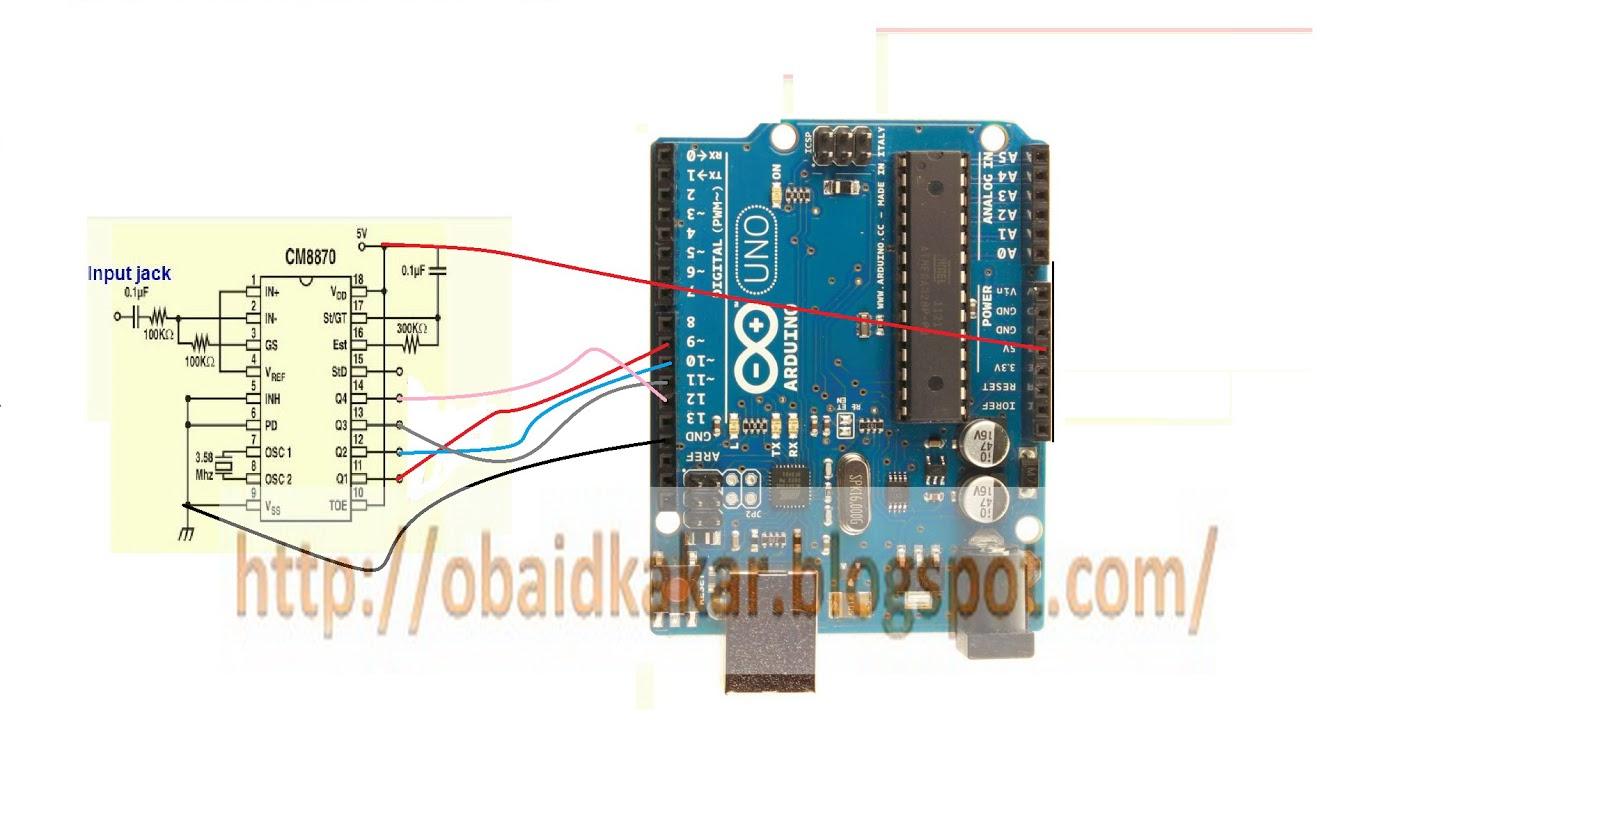 Ksf electronics arduino uno dtmf based car gps tracker